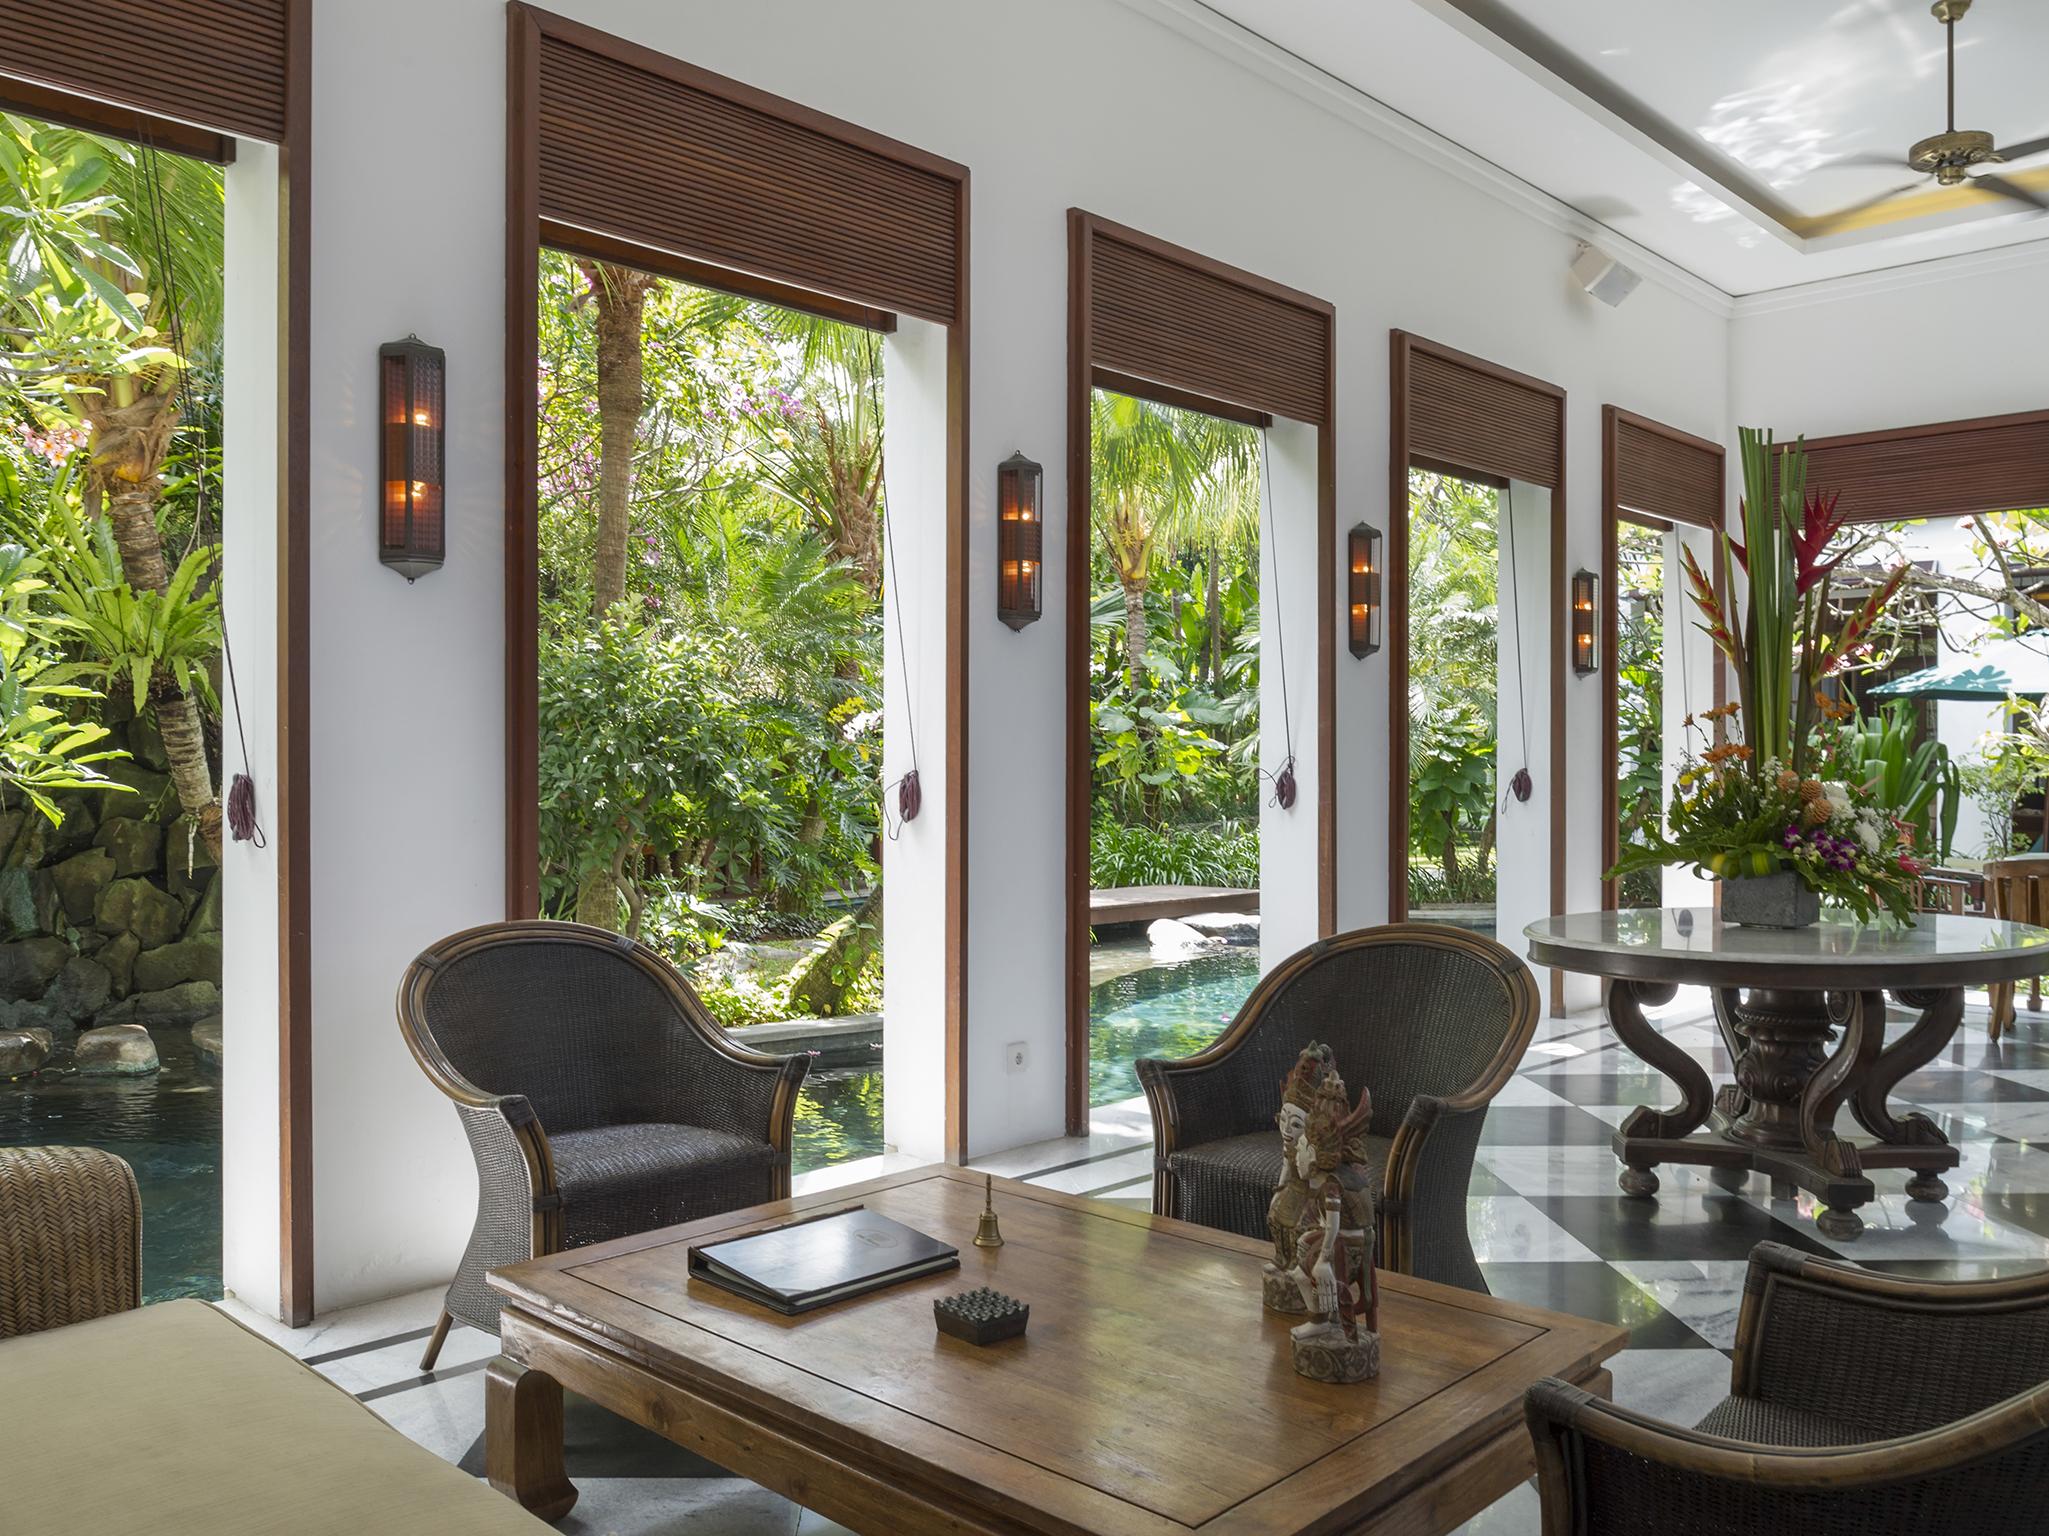 01-Villa Batavia - Breezy seating area.jpg